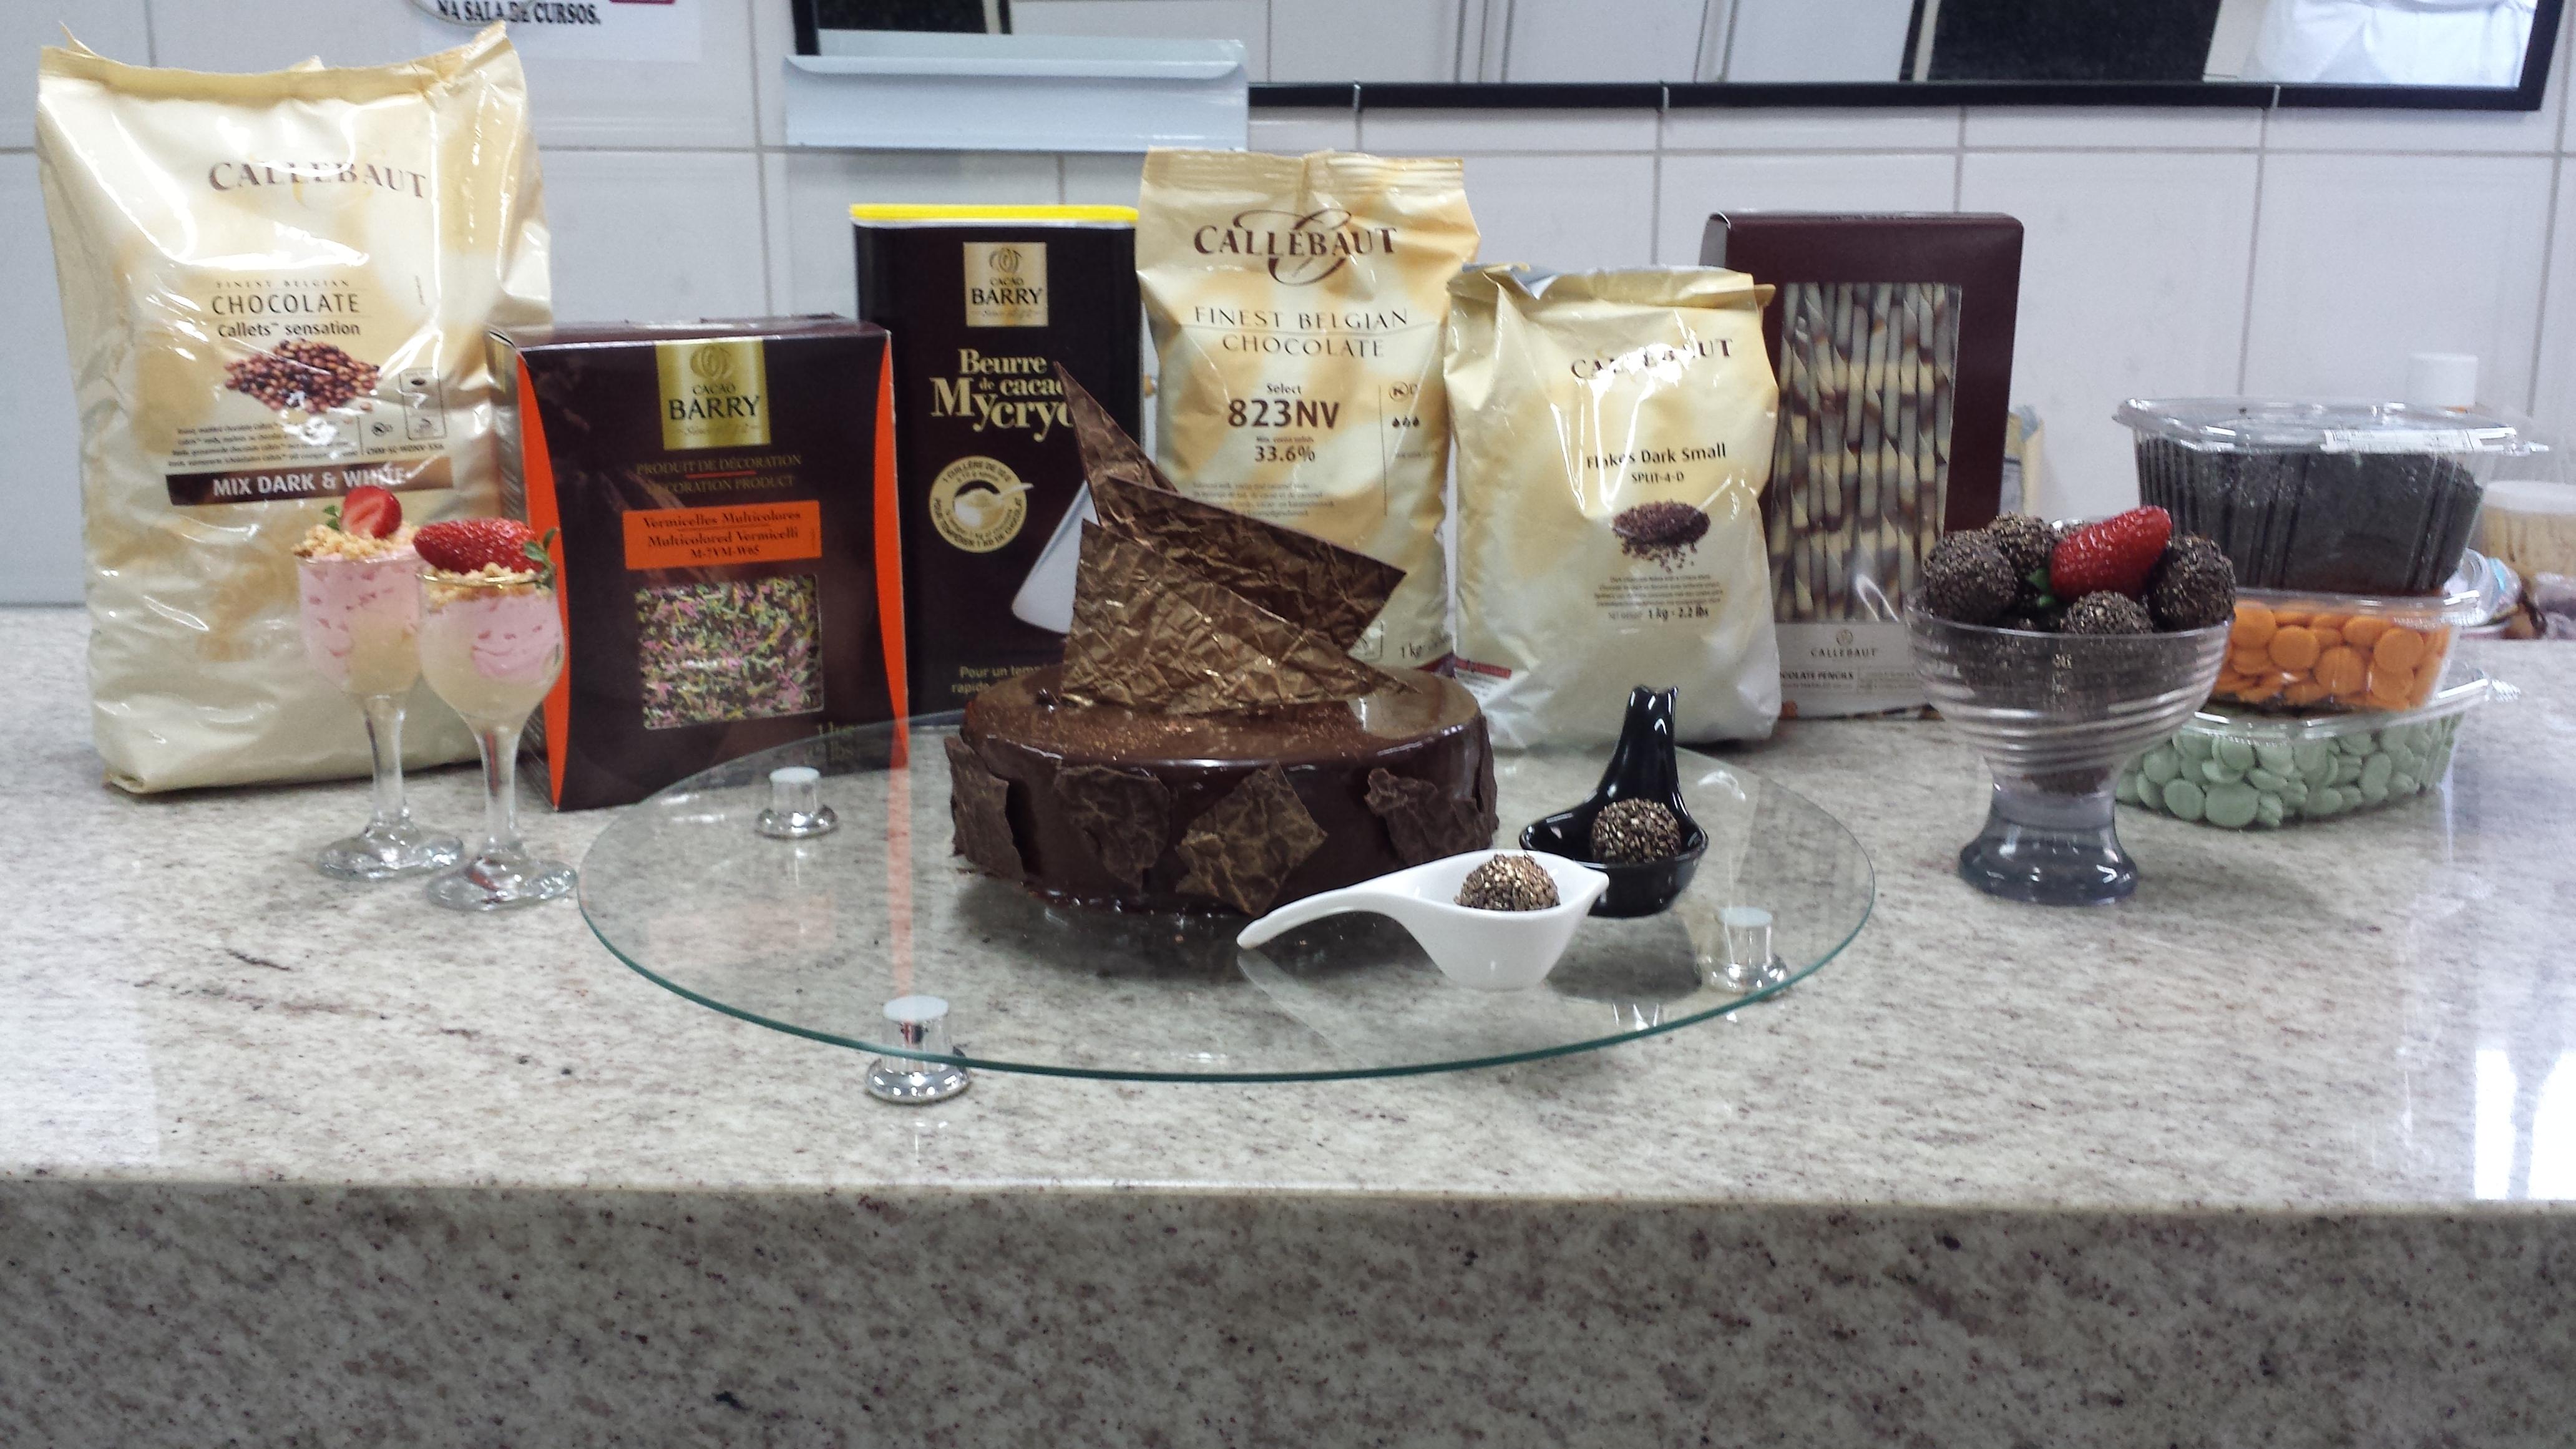 Trufa Natalina, Extrement de Chocolate e Verrine. 12/12/2014